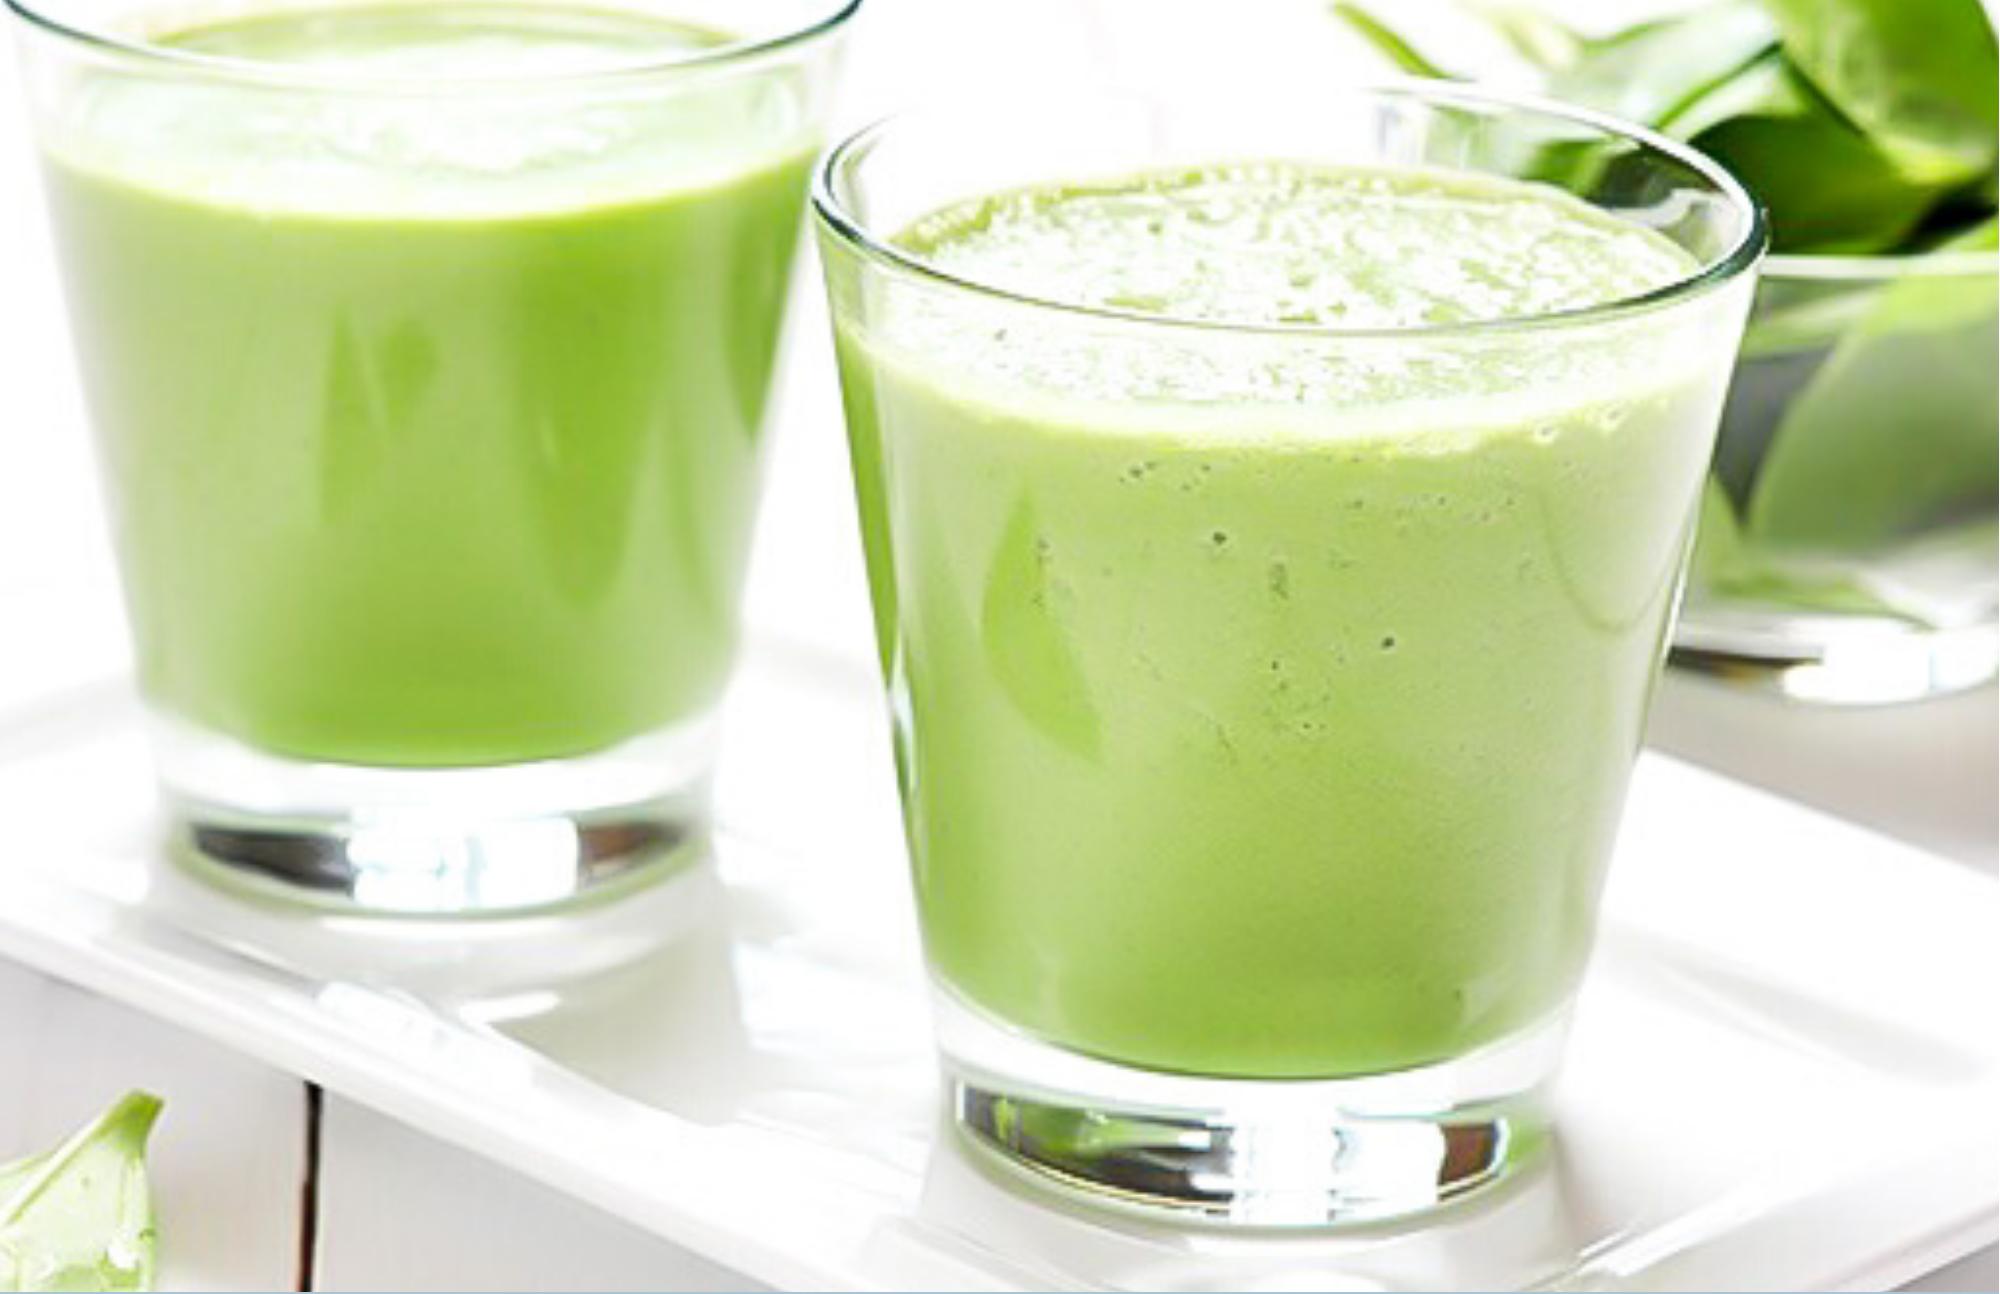 judith-rolf-groene-smoothies-17x11cm